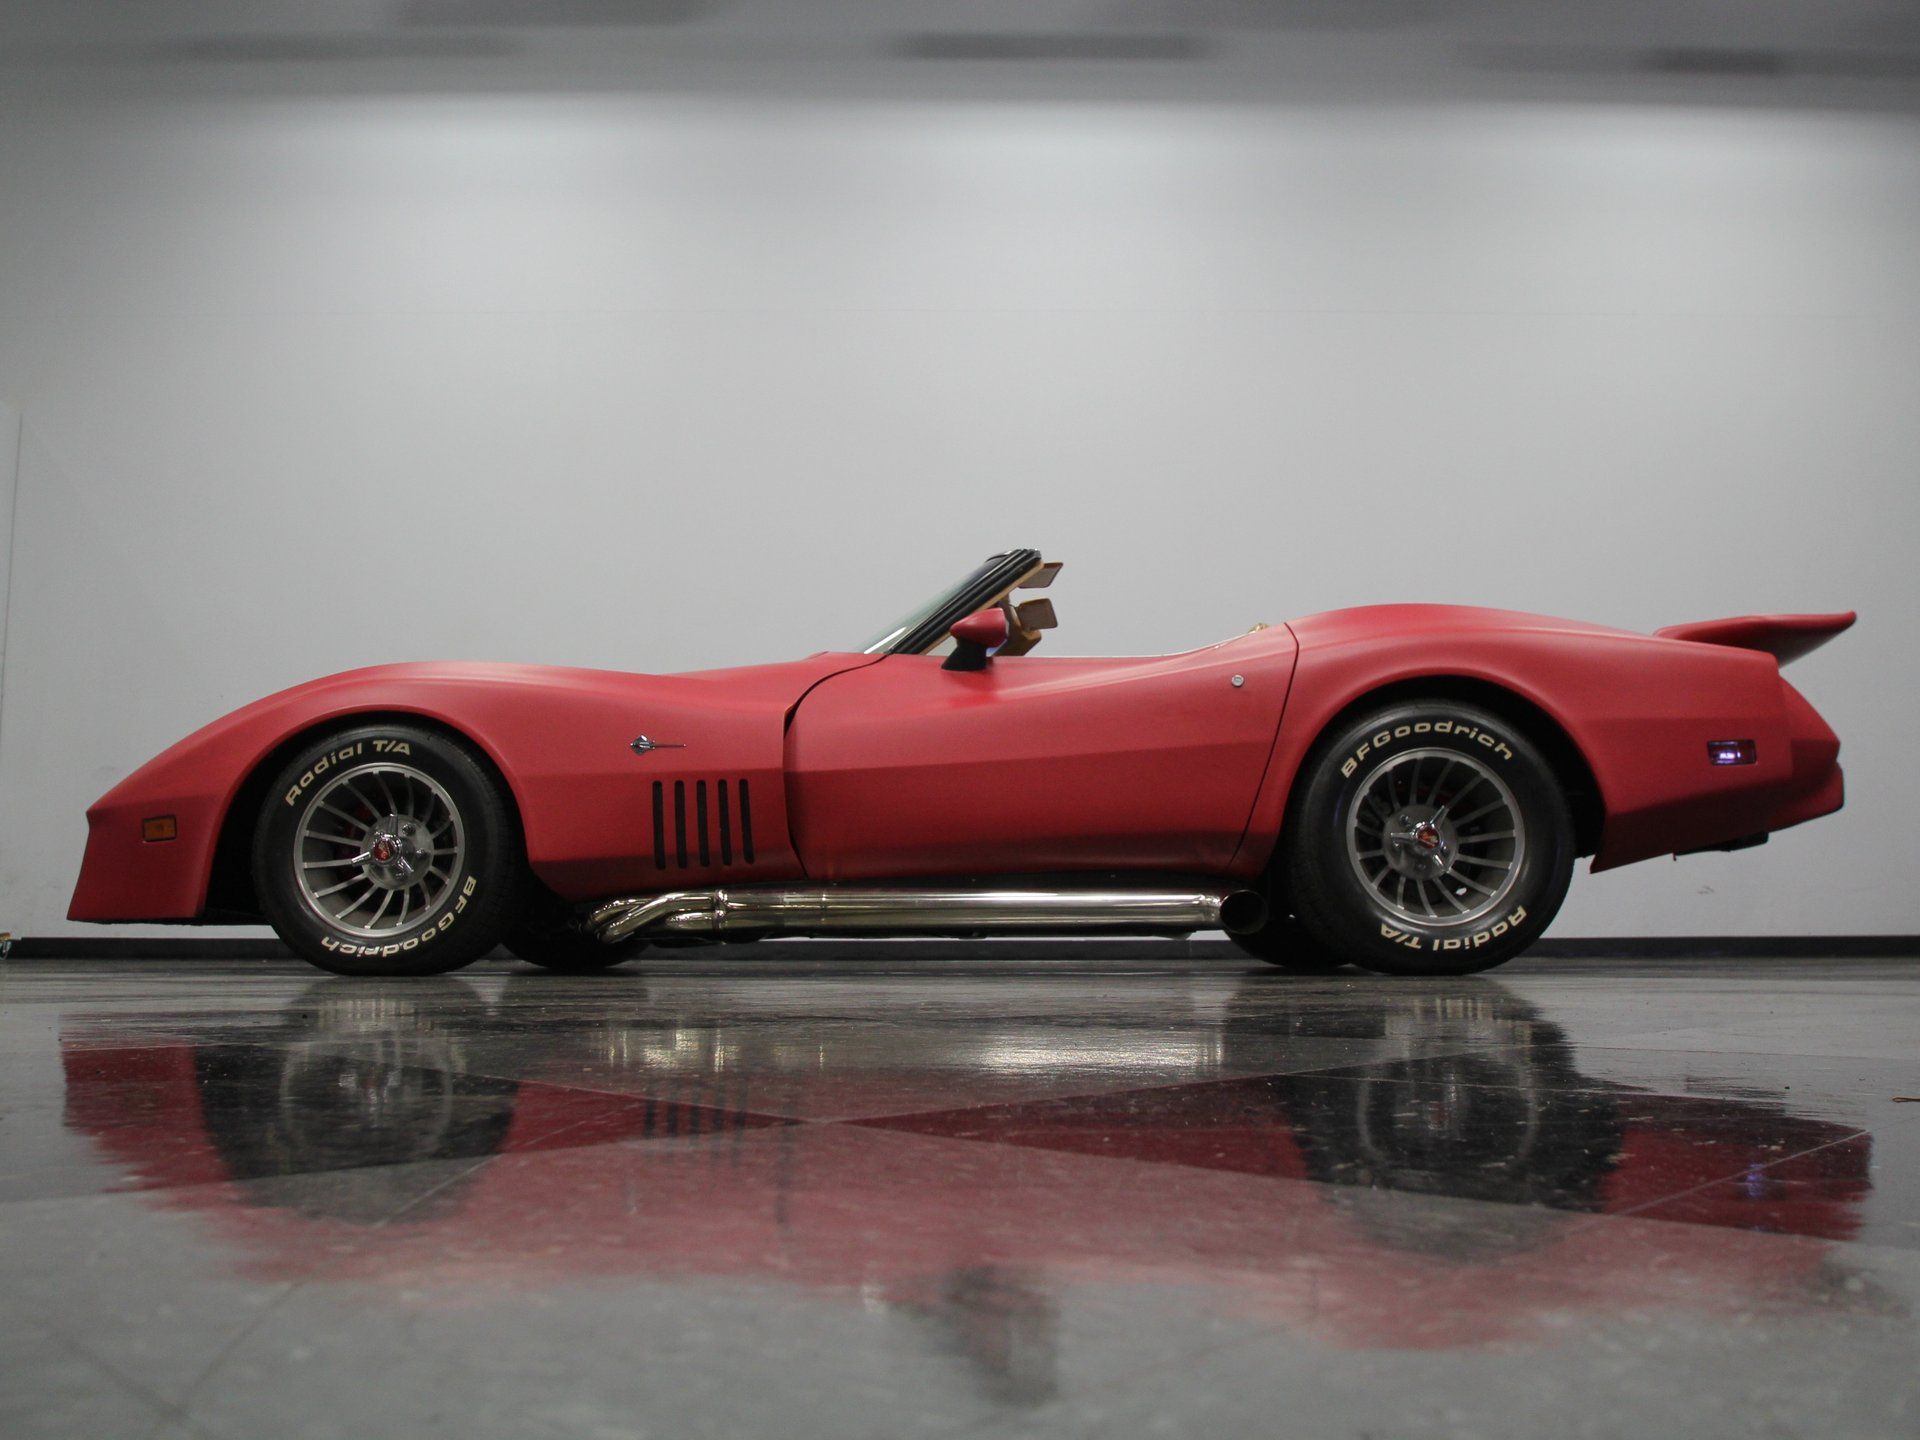 1971 Chevrolet Corvette | Streetside Classics - The Nation's